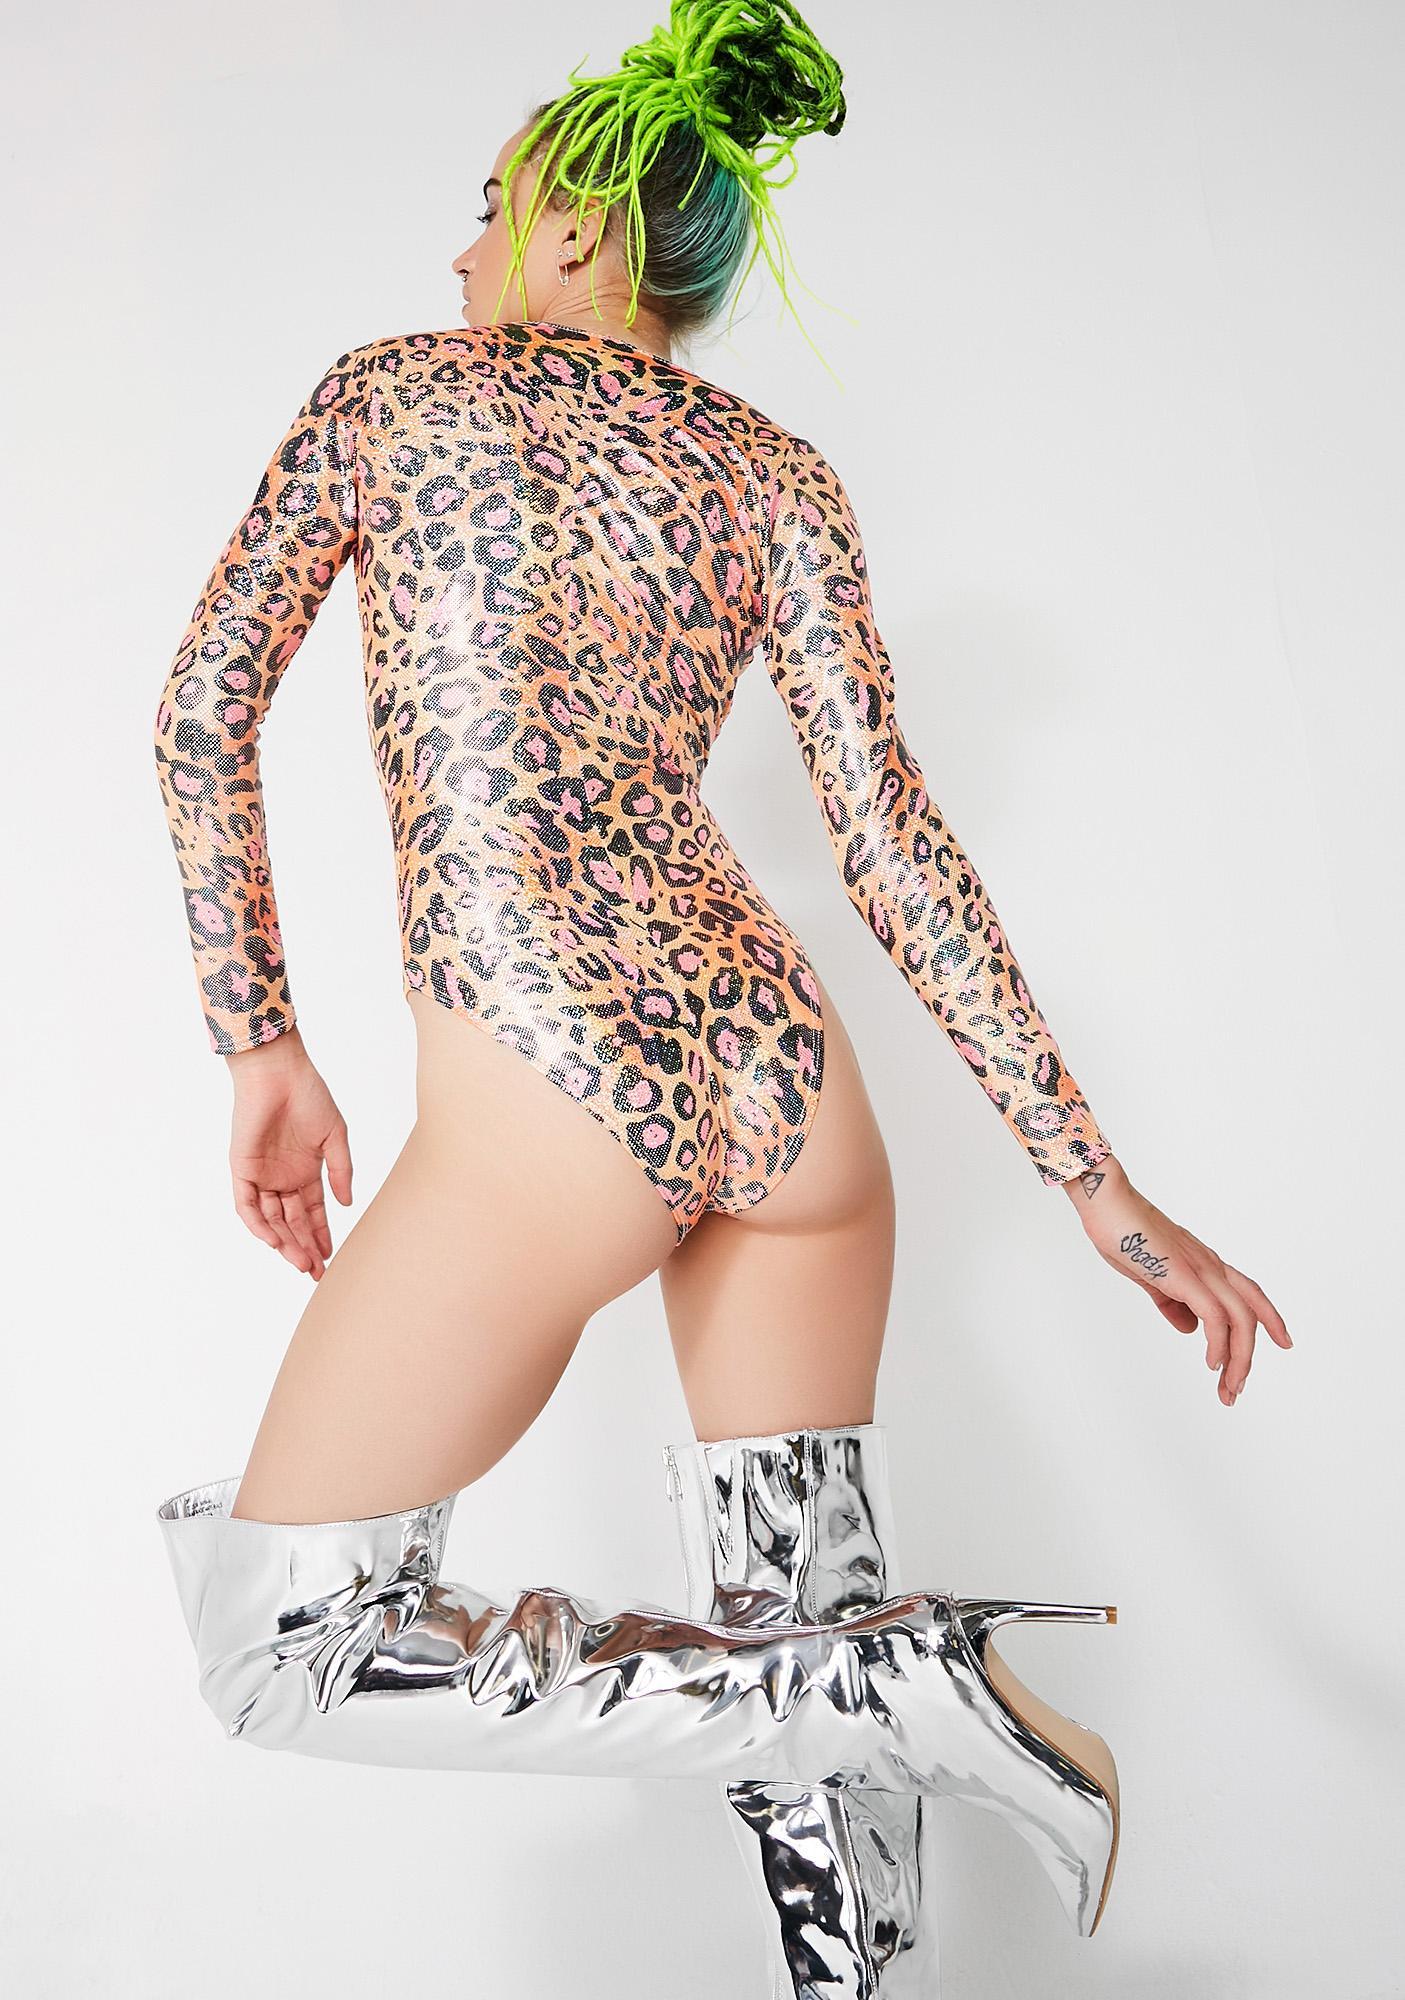 J Valentine Orange Leopard Lace-Up Bodysuit